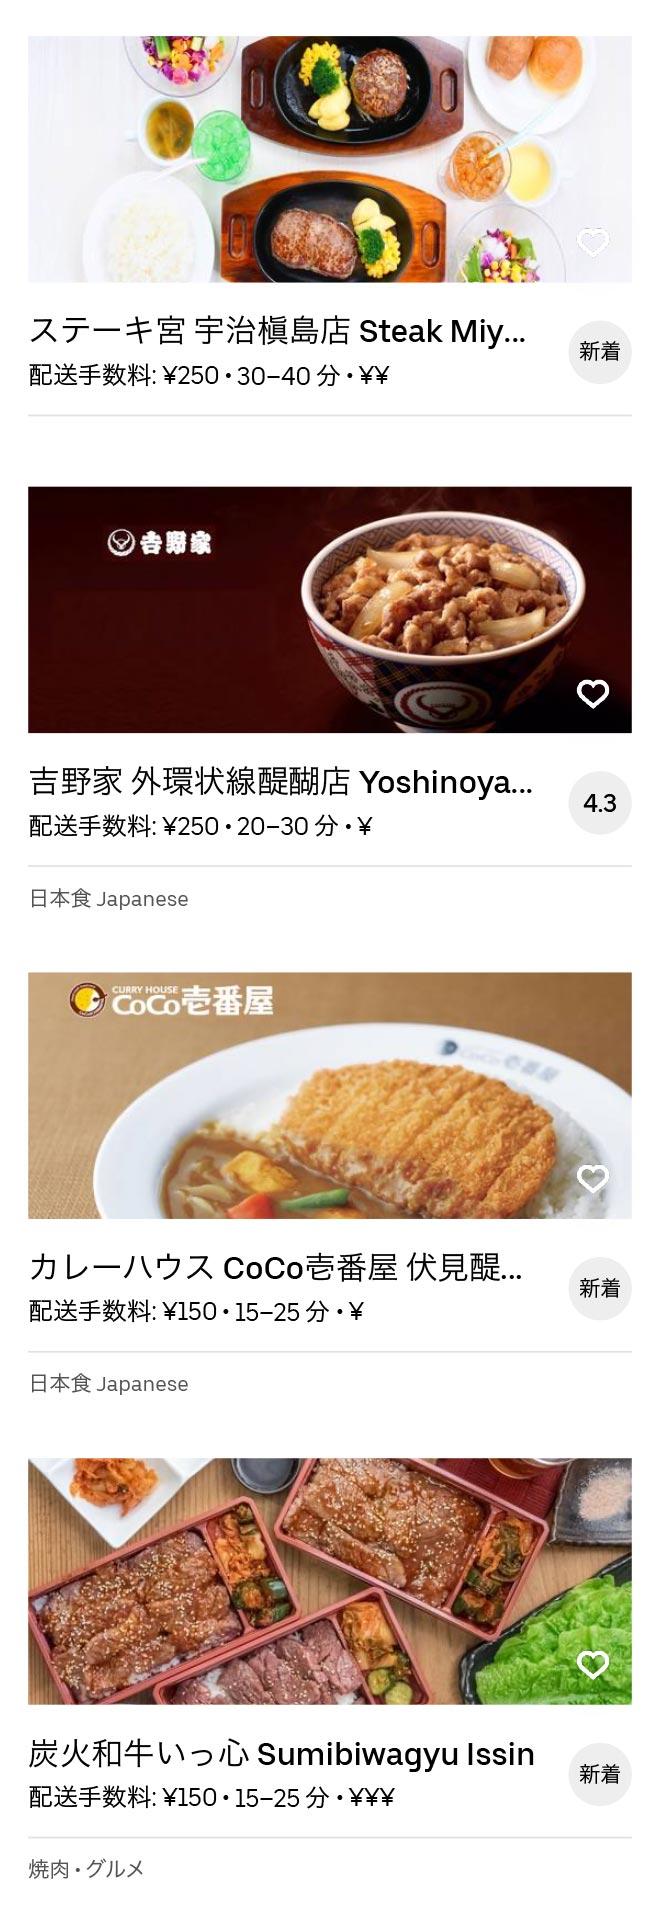 Uji rokujizo menu 2005 03